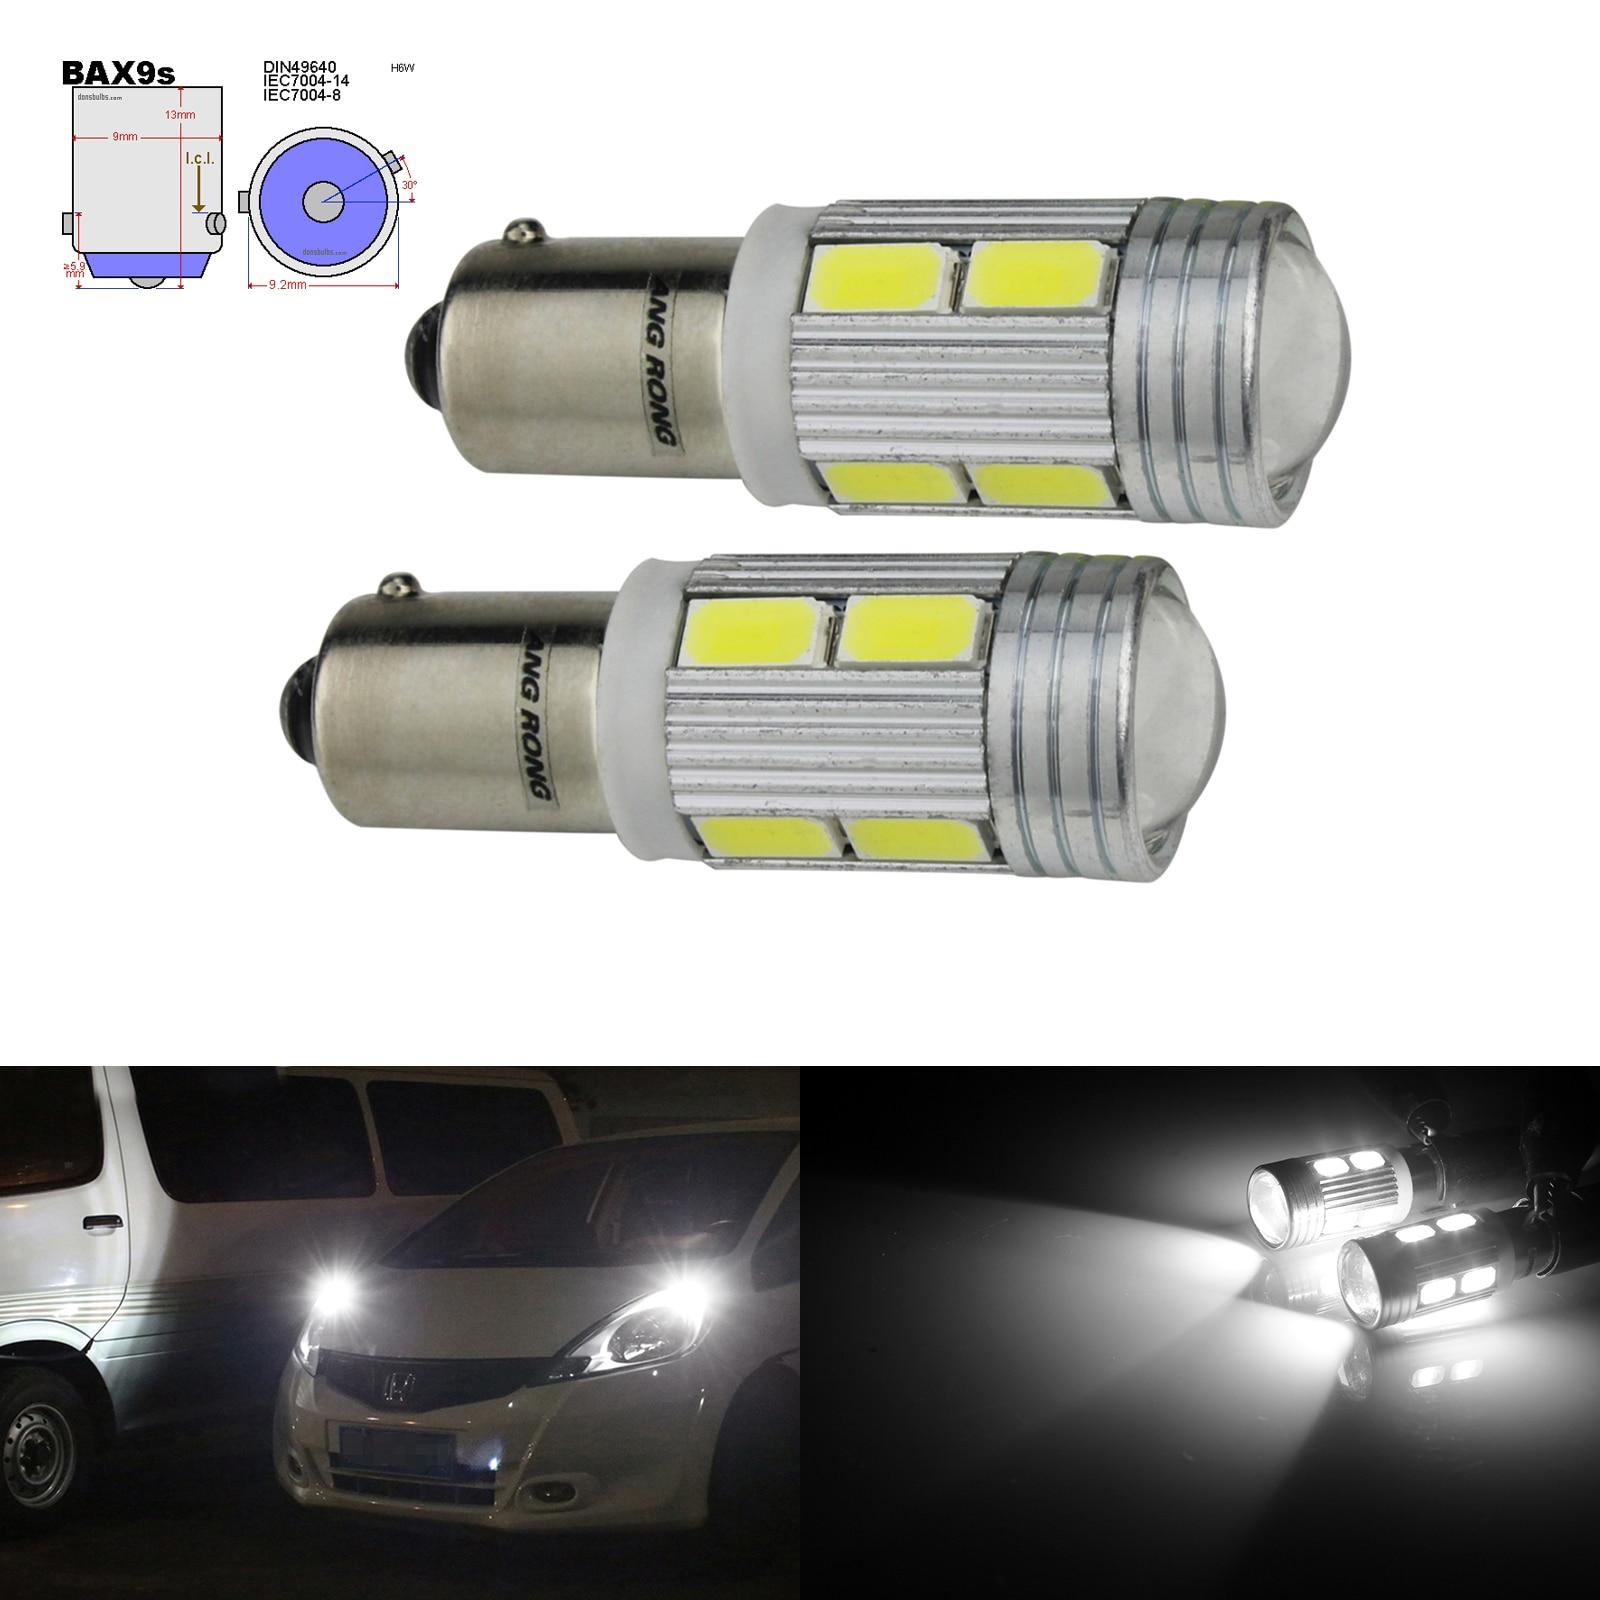 ANGRONG 2 шт. H6W BAX9S лампы 10 светодиодов 8 Вт парковка Sidelight белый для BMW 3 серии F30 F31 F34